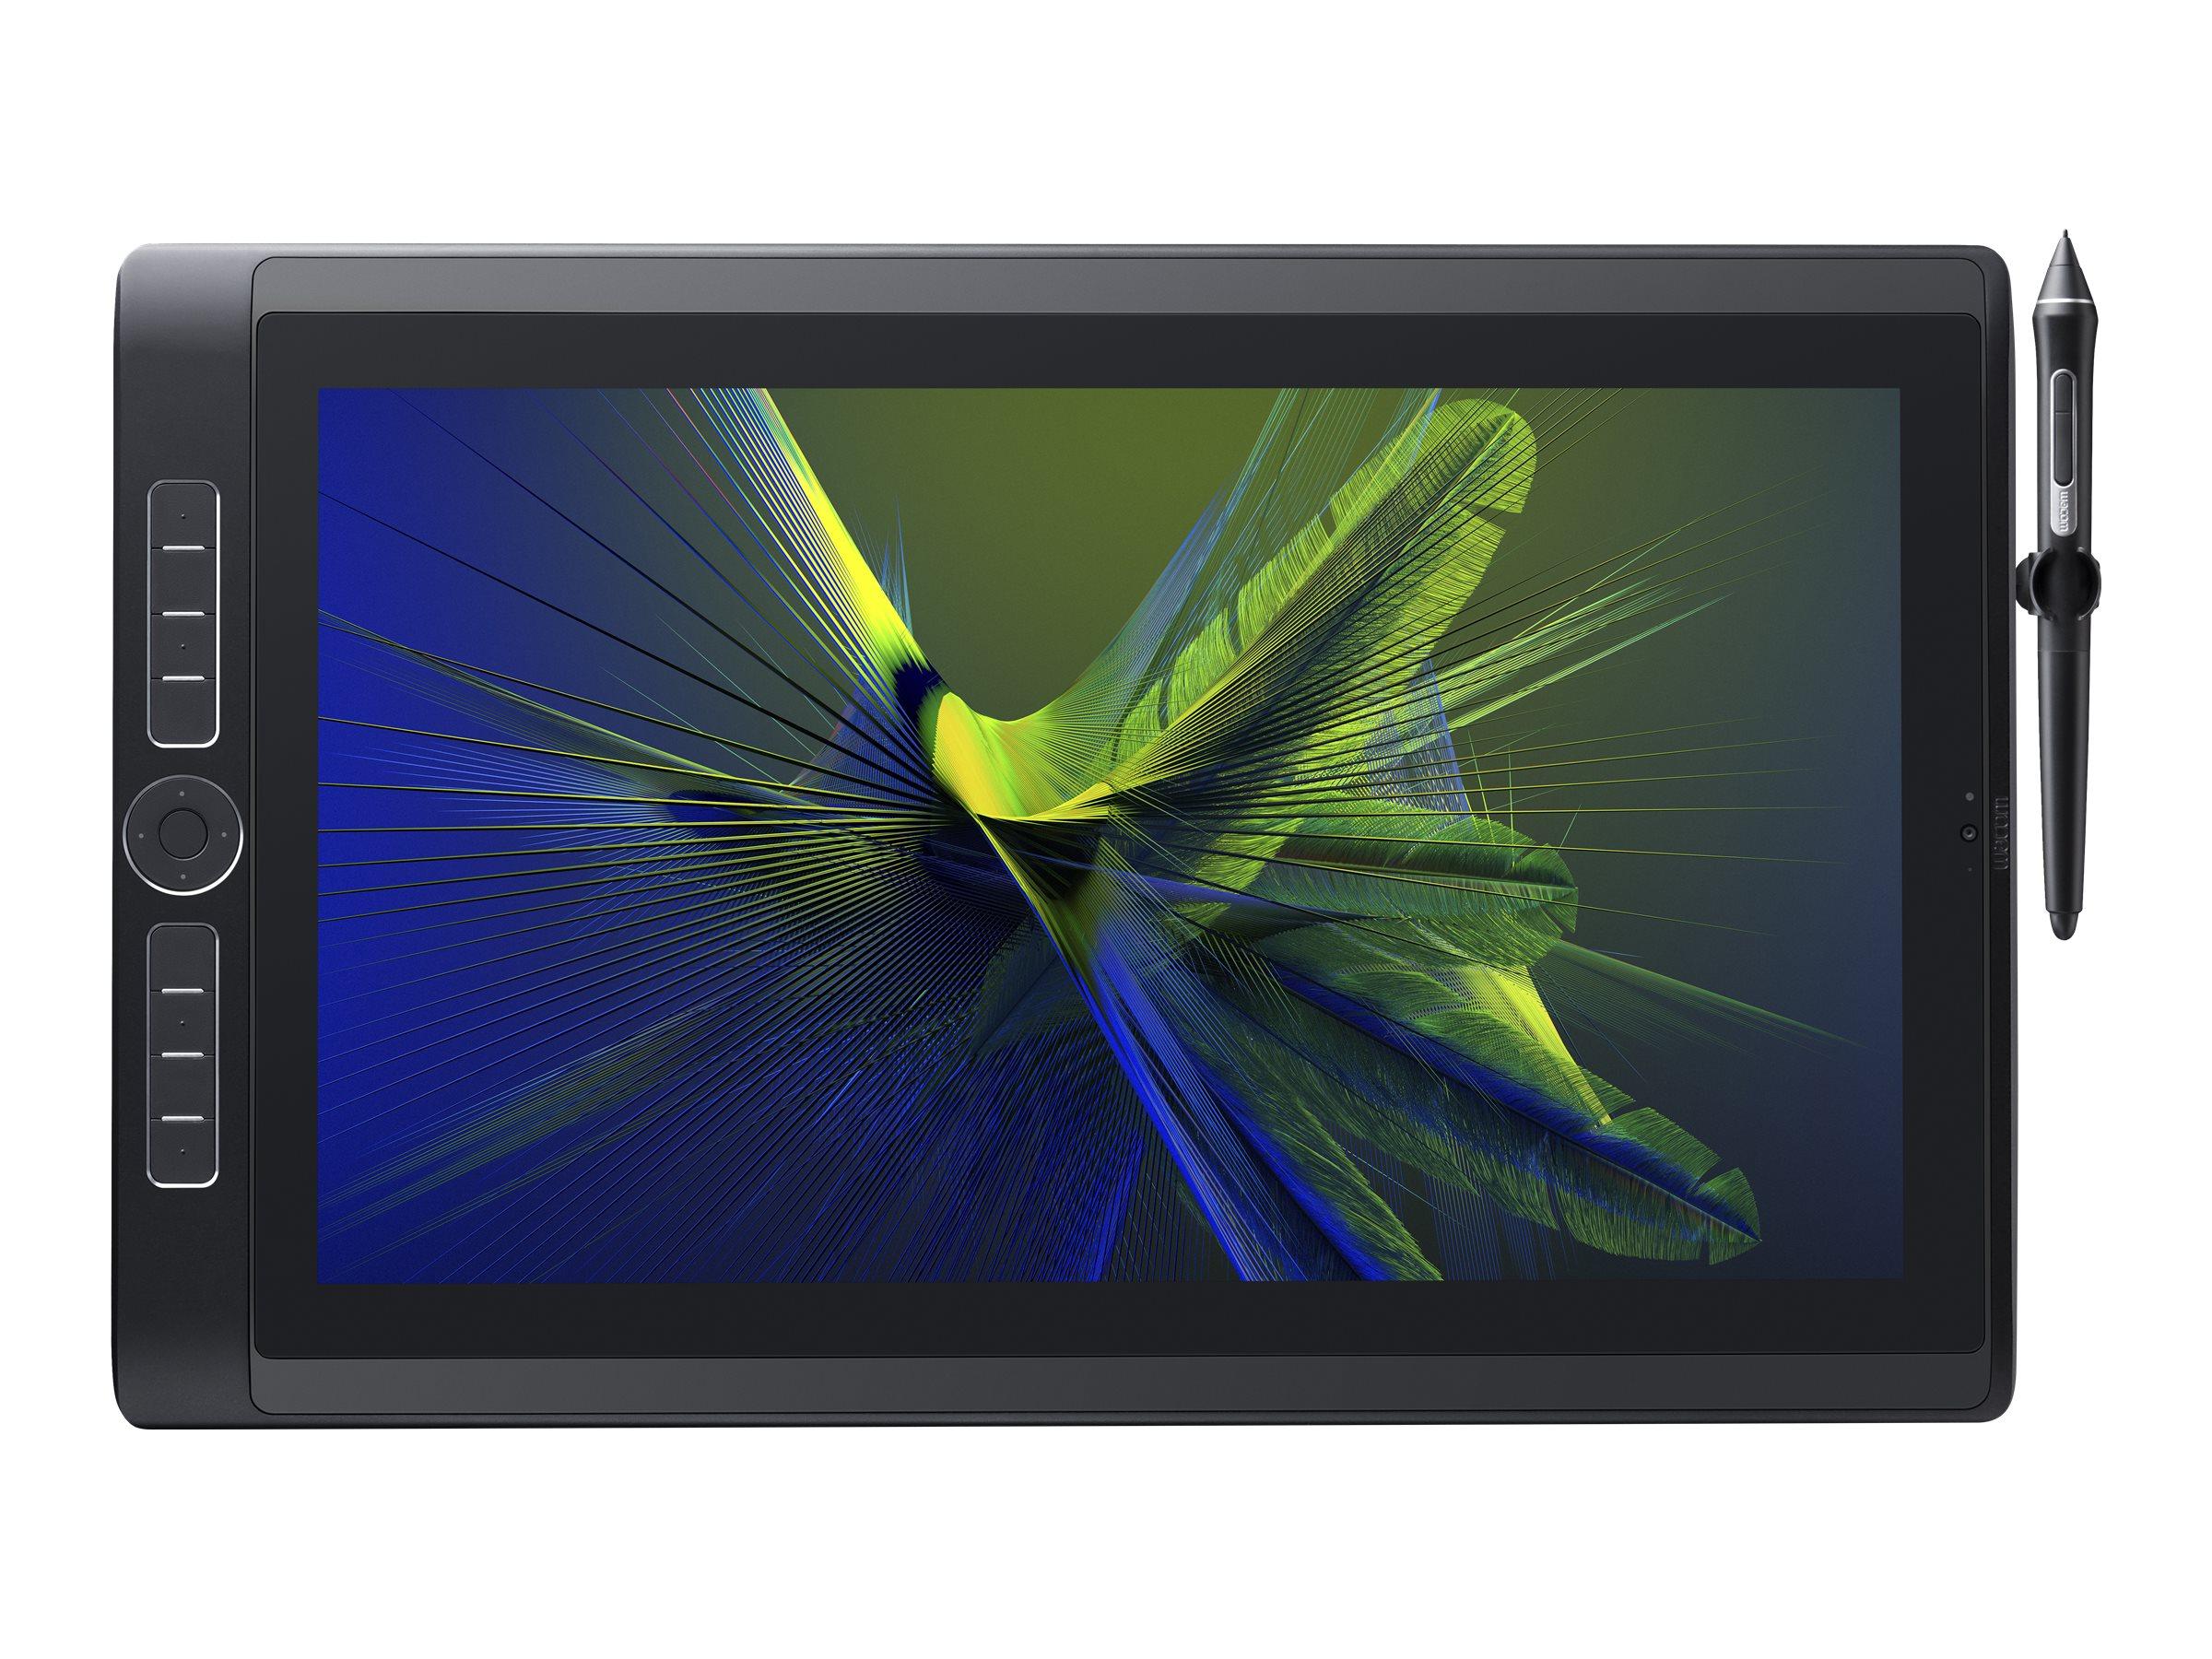 Wacom MobileStudio Pro DTH-W1620H - Tablet - Core i7 6567U / 3.3 GHz - Win 10 Pro - 16 GB RAM - 512 GB SSD